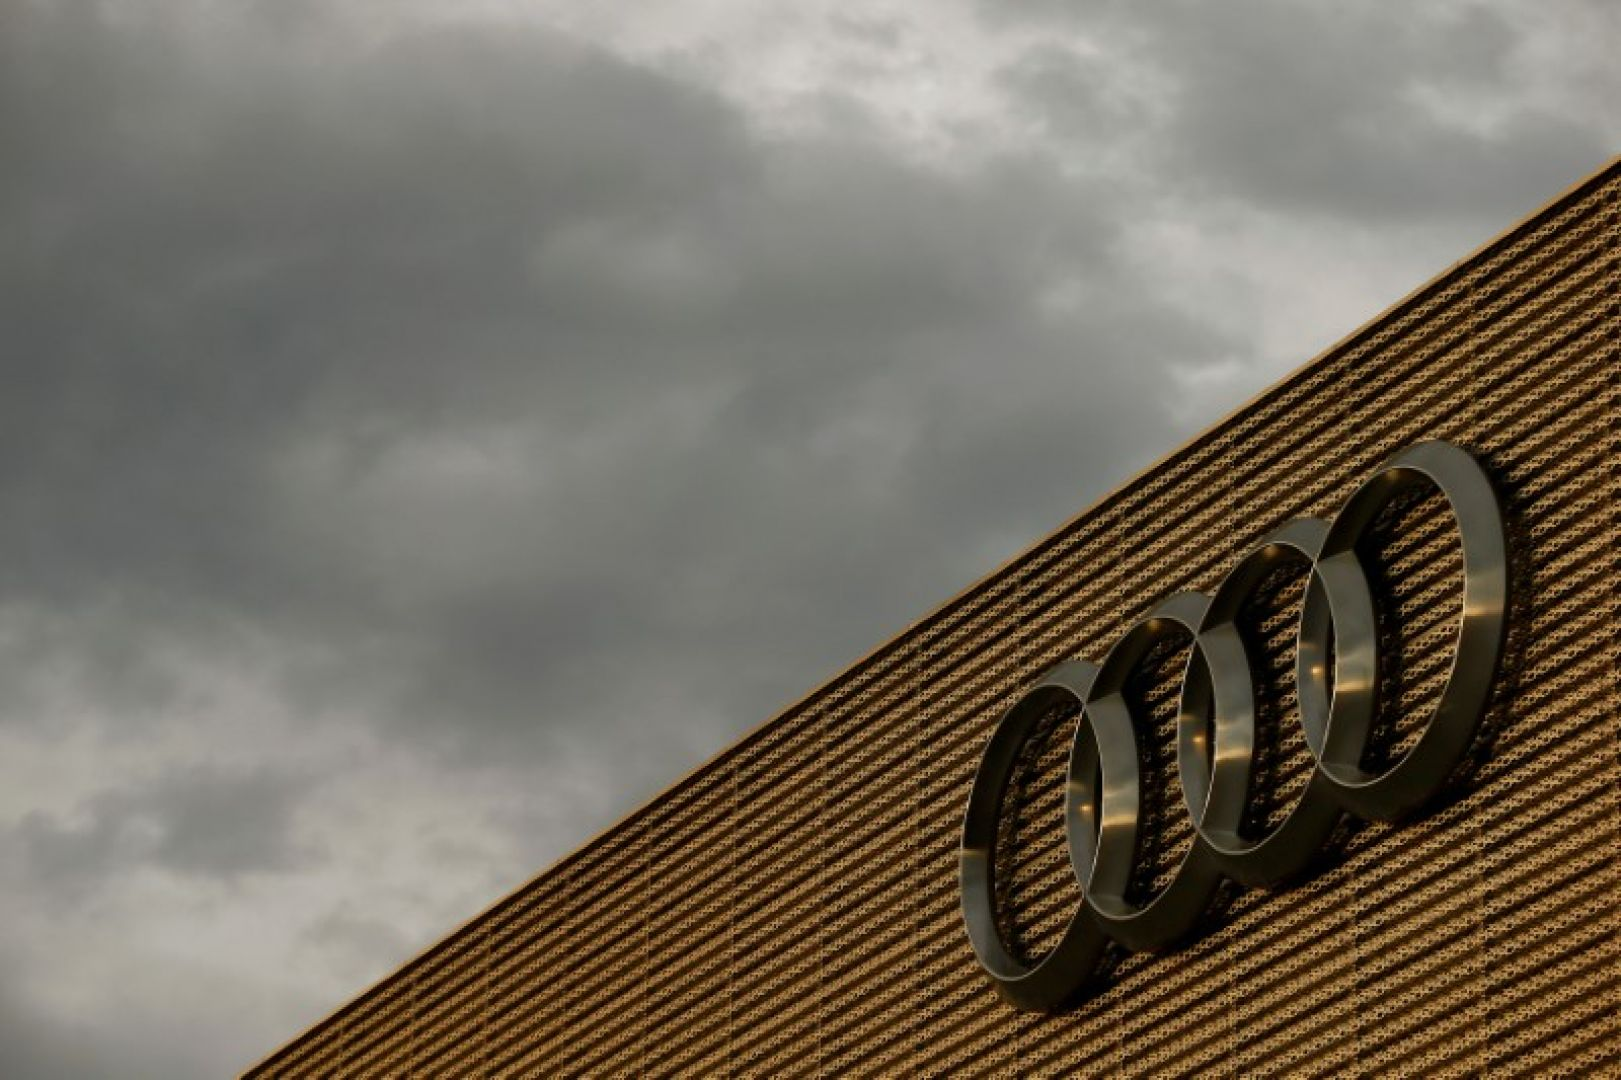 Над компанией Audi сгущаются тучи 1